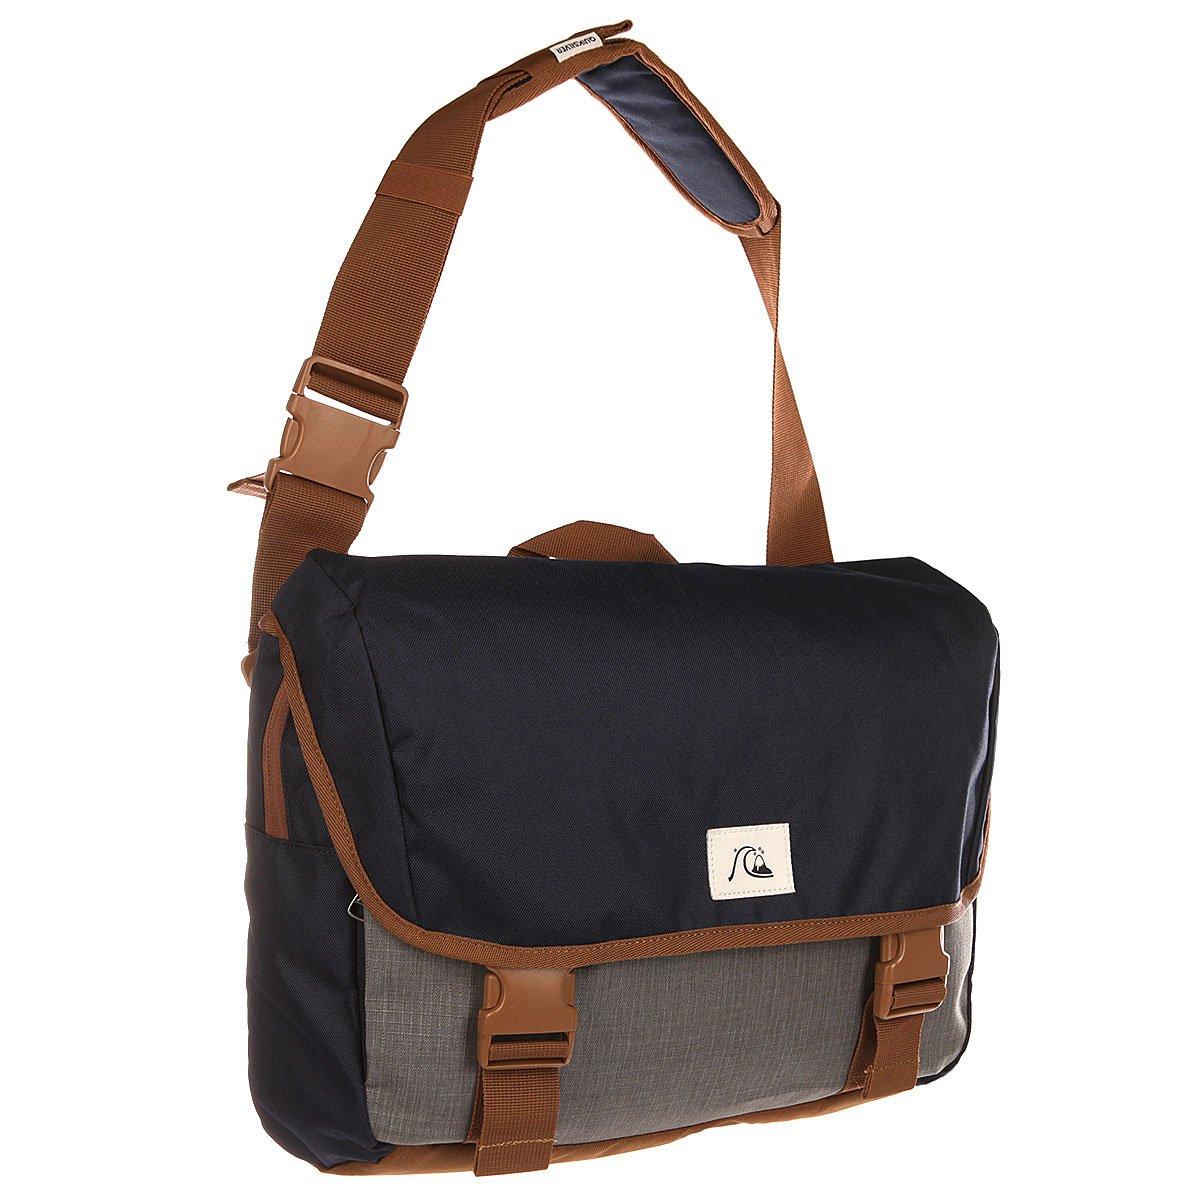 9be2cef79e83 Купить сумку через плечо Quiksilver Carrier Ii Castlerock ...